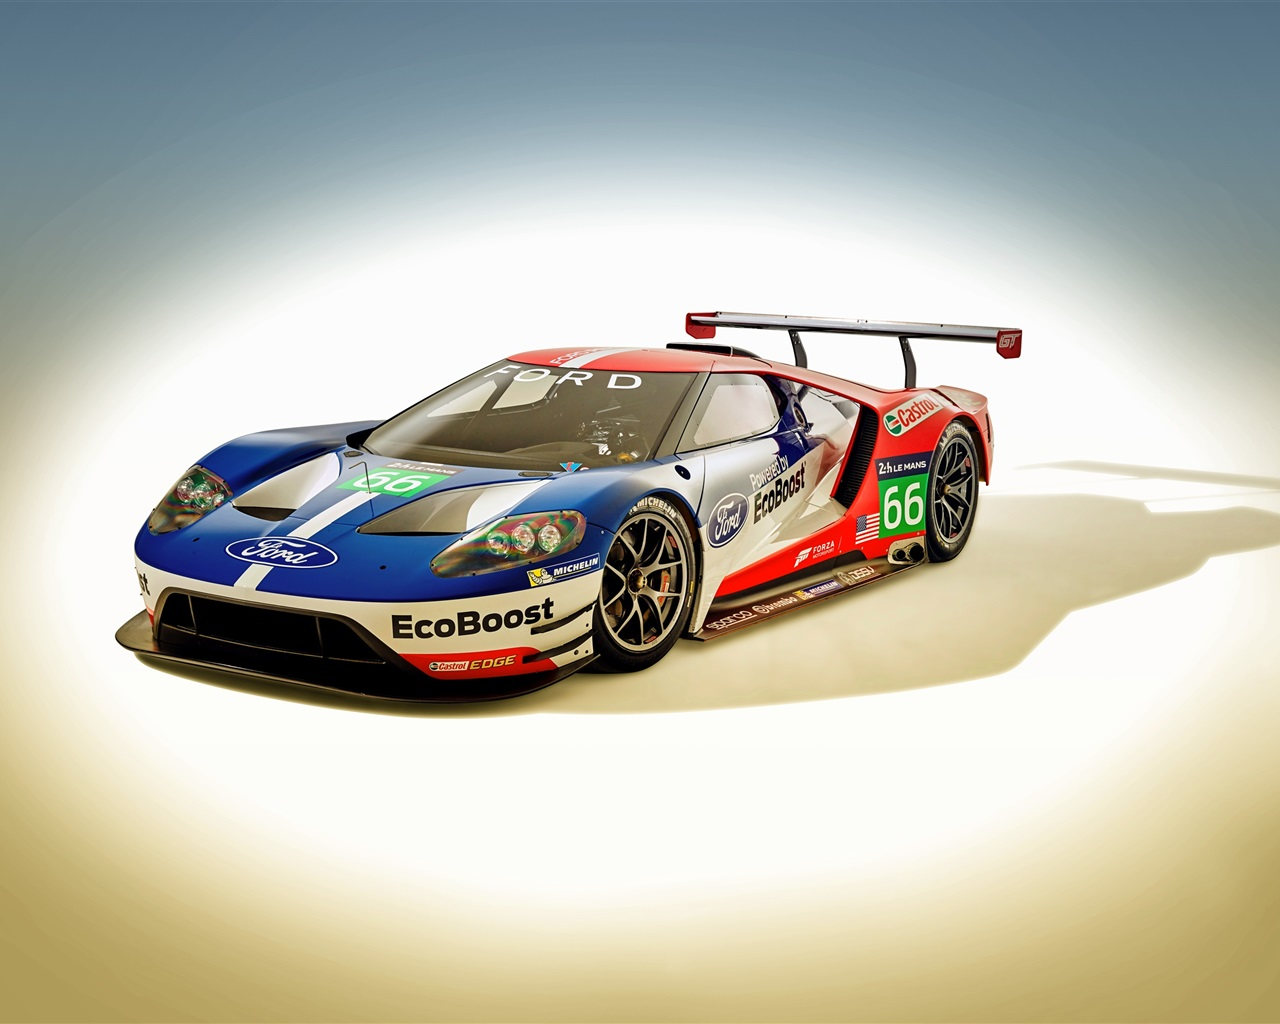 2016 Ford GT Le Mans Race Car